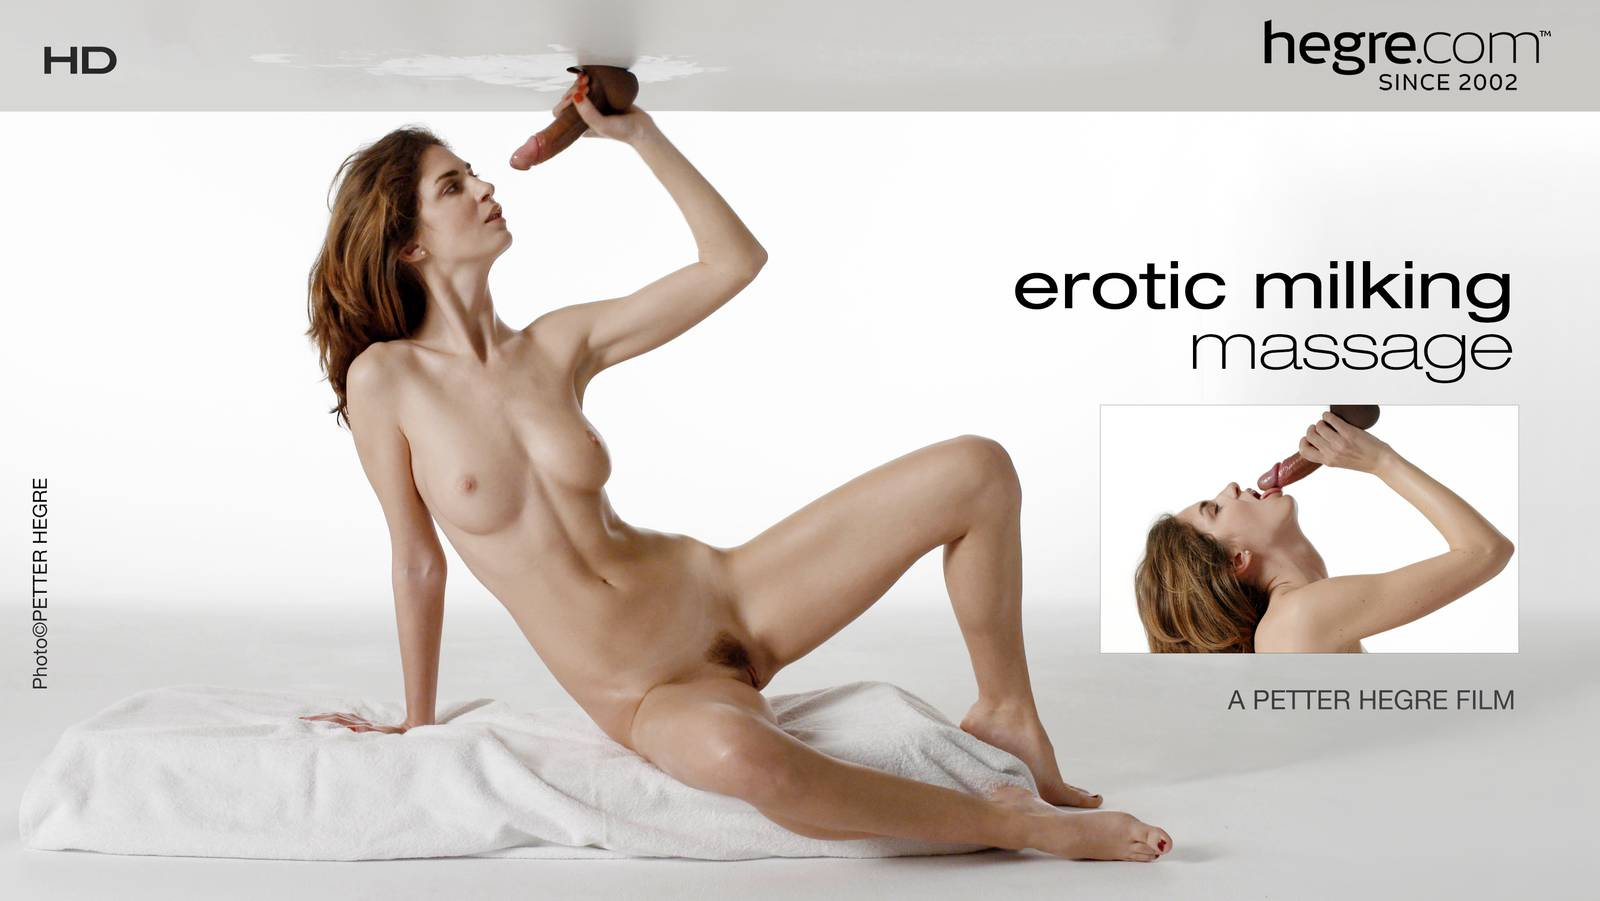 erotic massage in katy texas